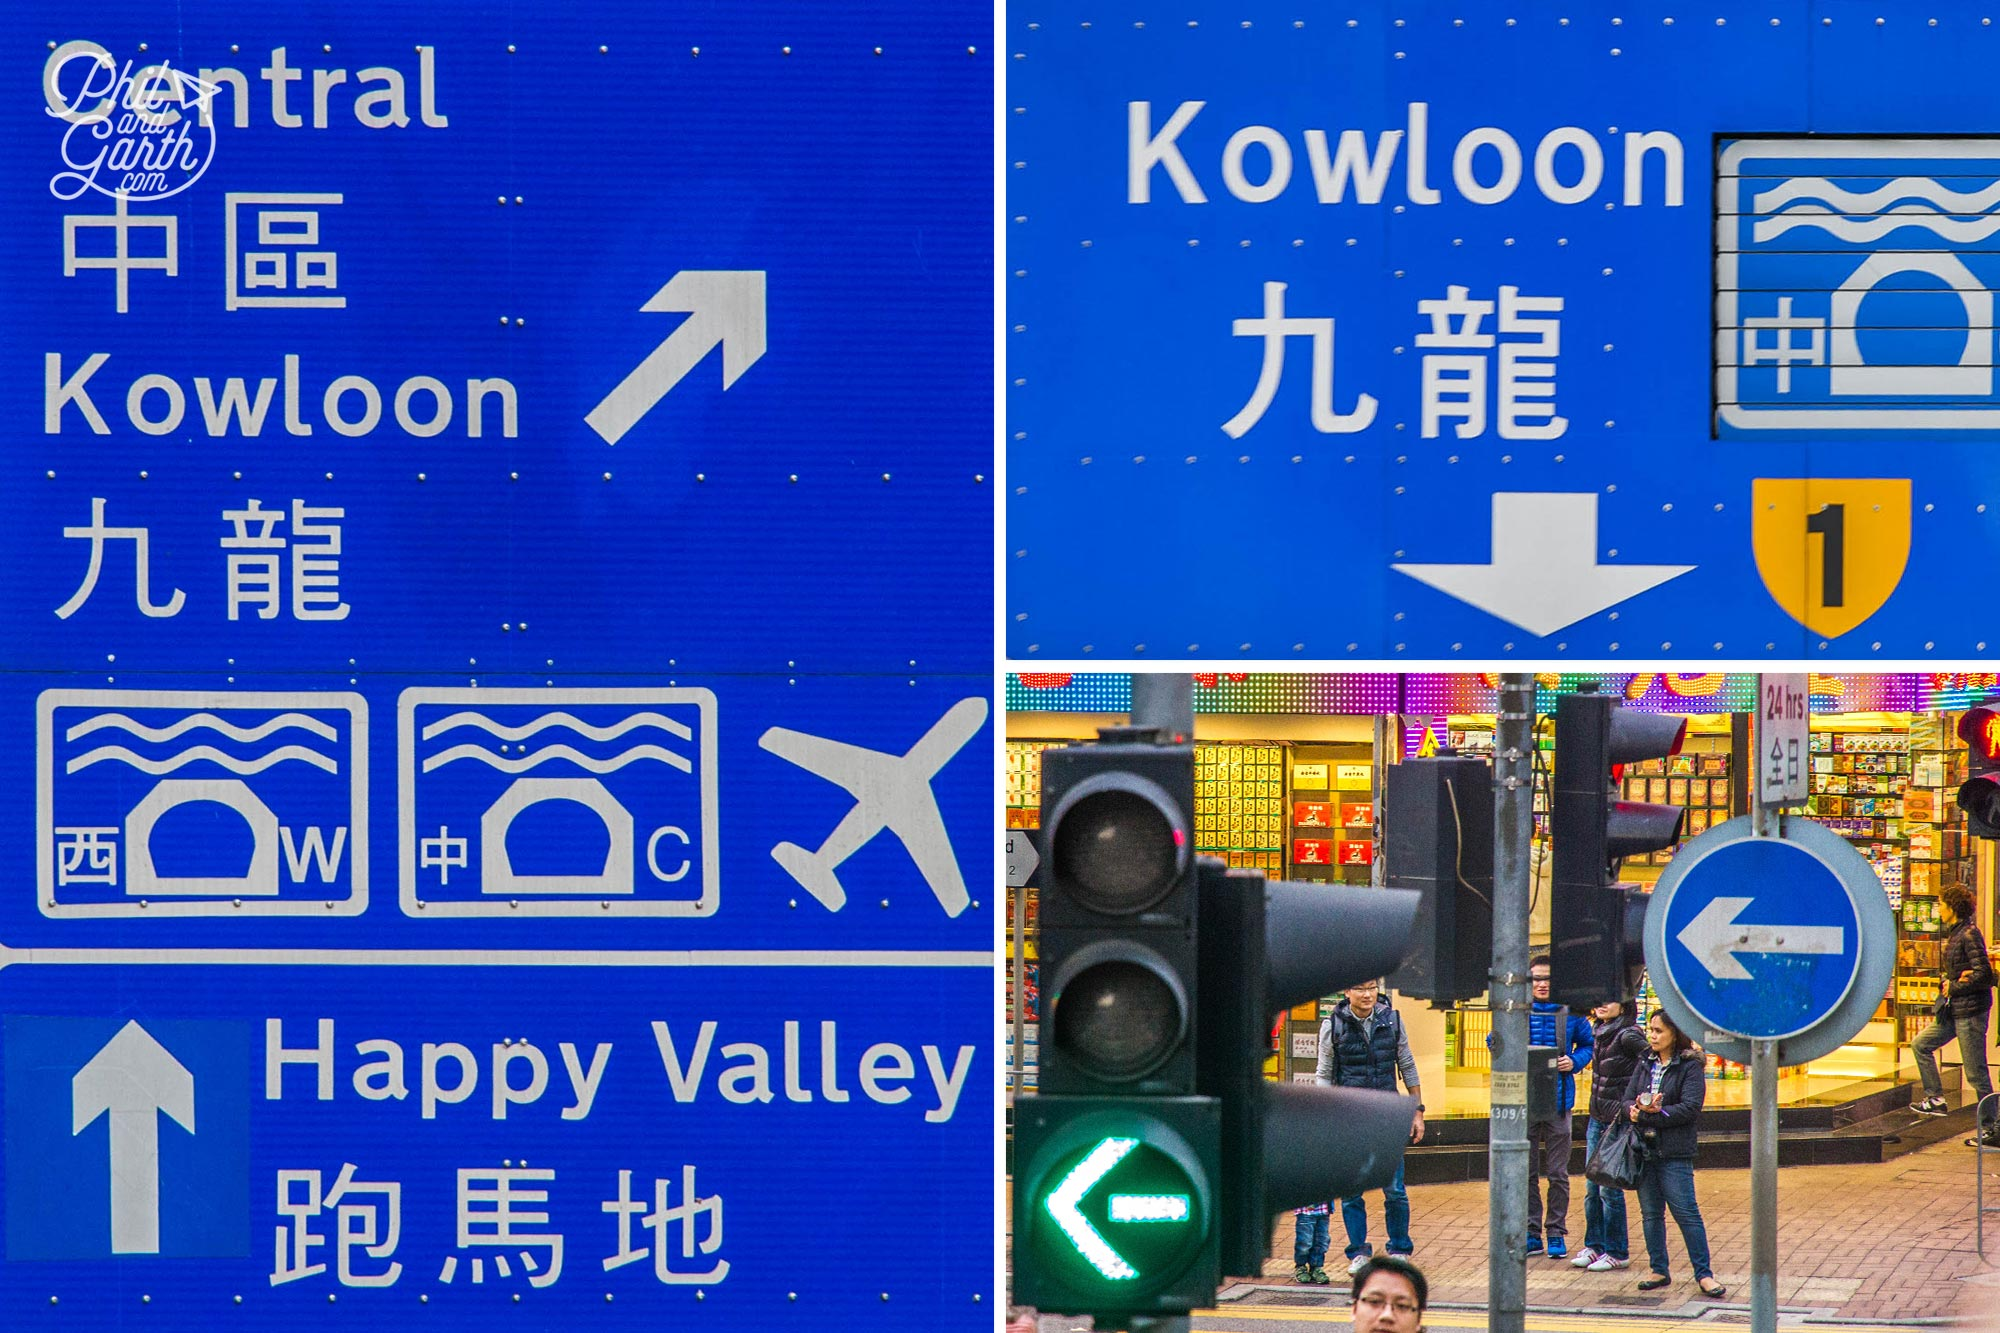 Hong Kong's British style signs and traffic lights